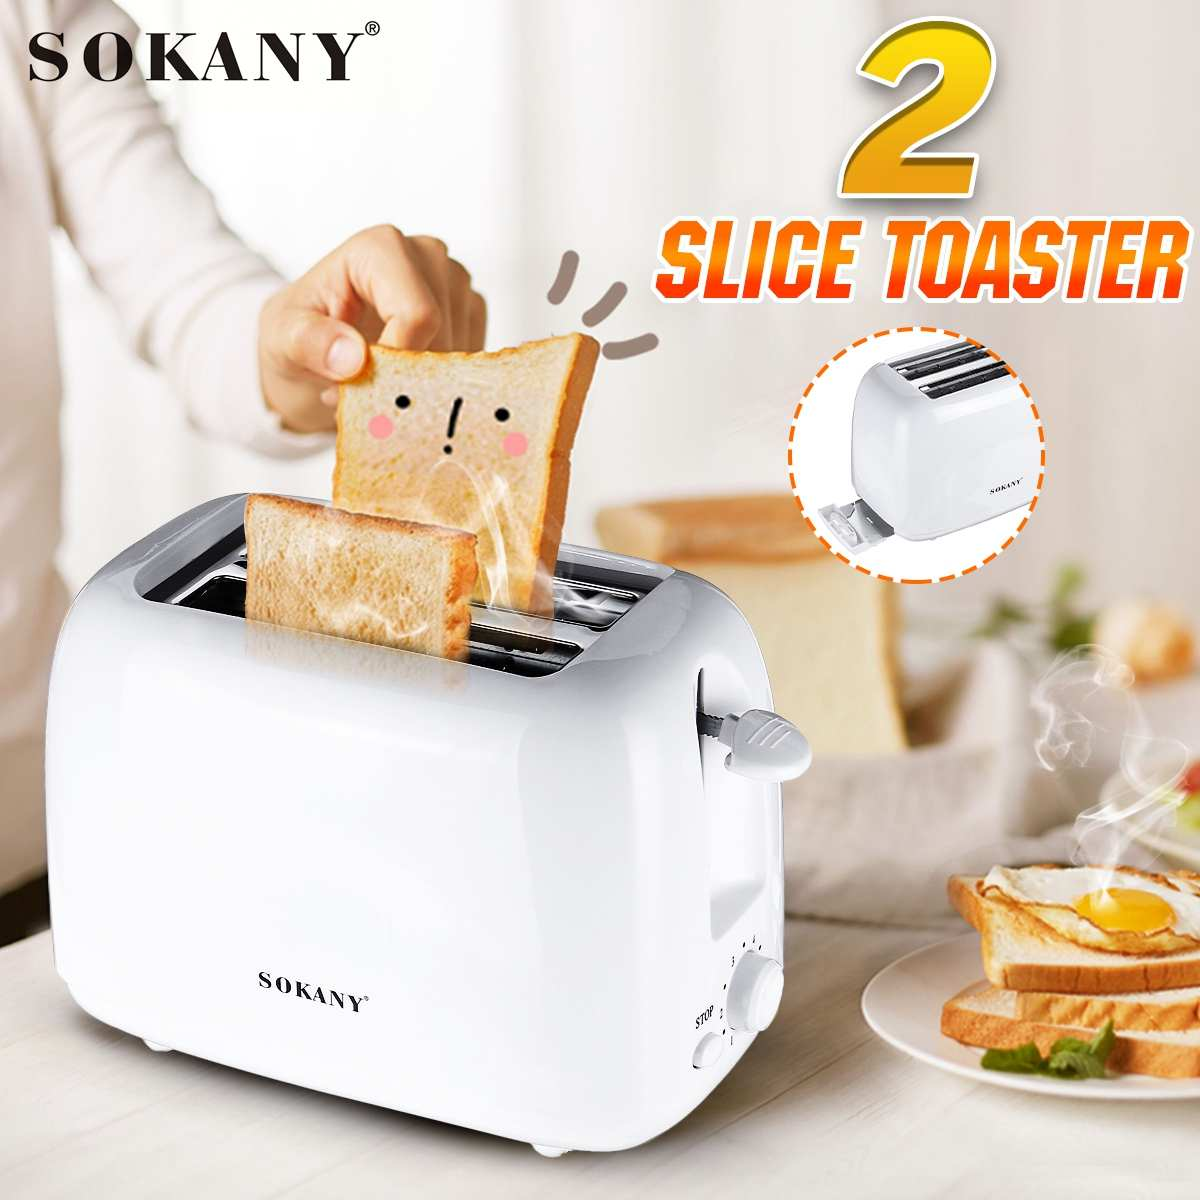 SOKANY Toaster Machine 2 Slices Bread Oven Sandwich 700W Toaster 6 gear Baking Breakfast Sandwich fast Heating safety maker